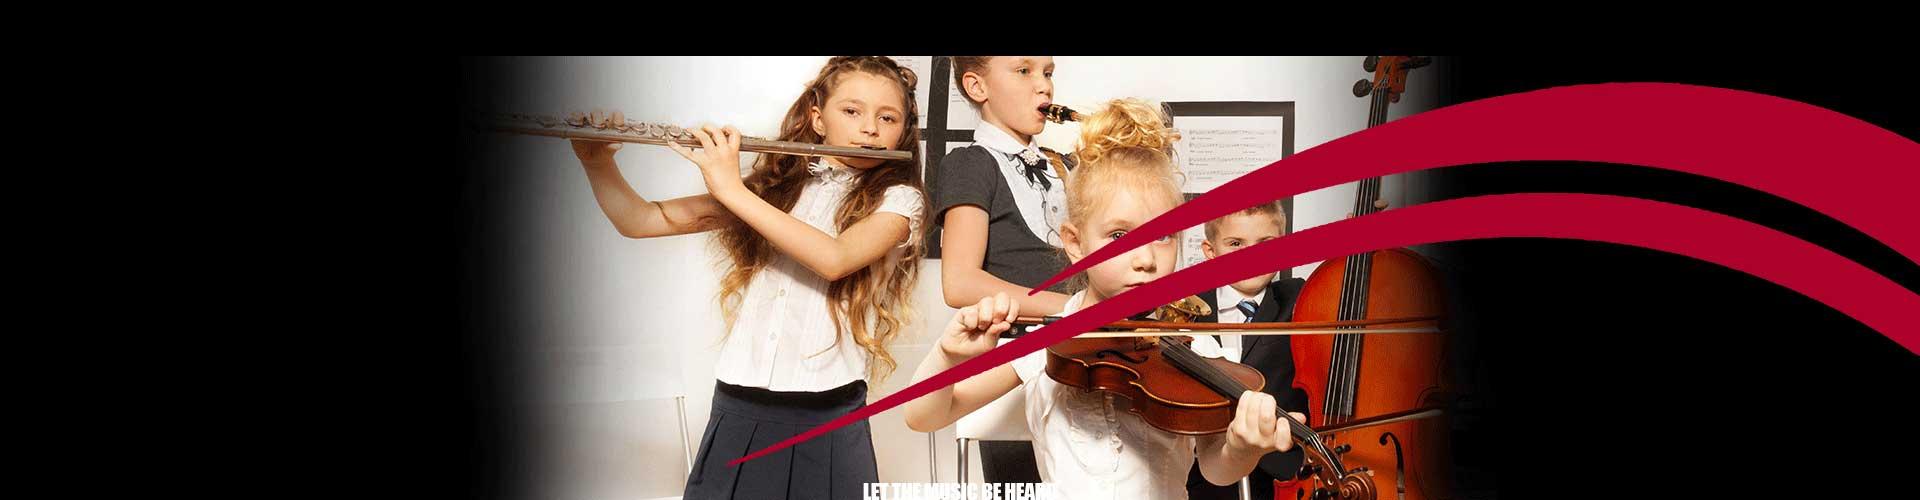 Students & Teachers Music Performances in Abu Dhabi UAE